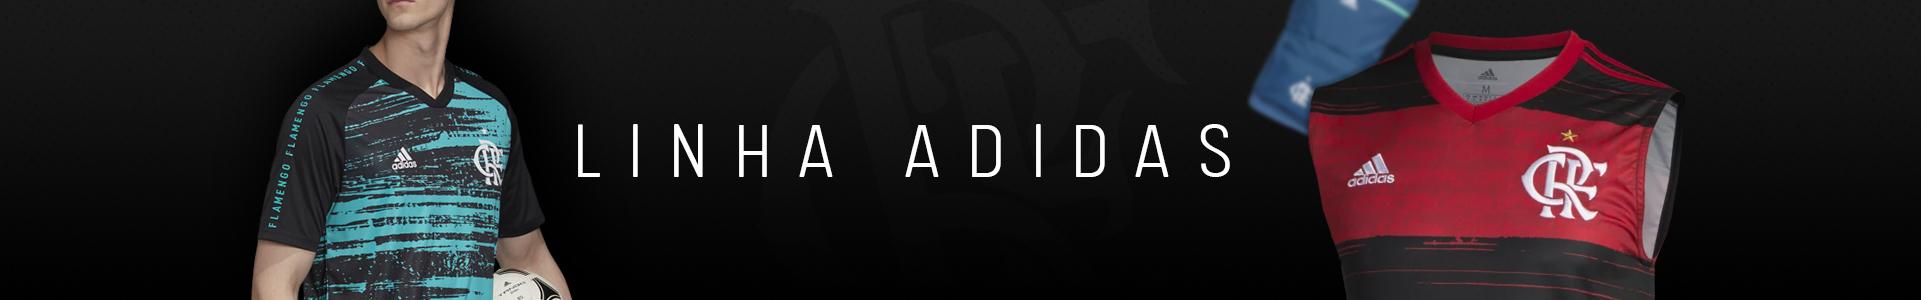 Banner Linha Adidas